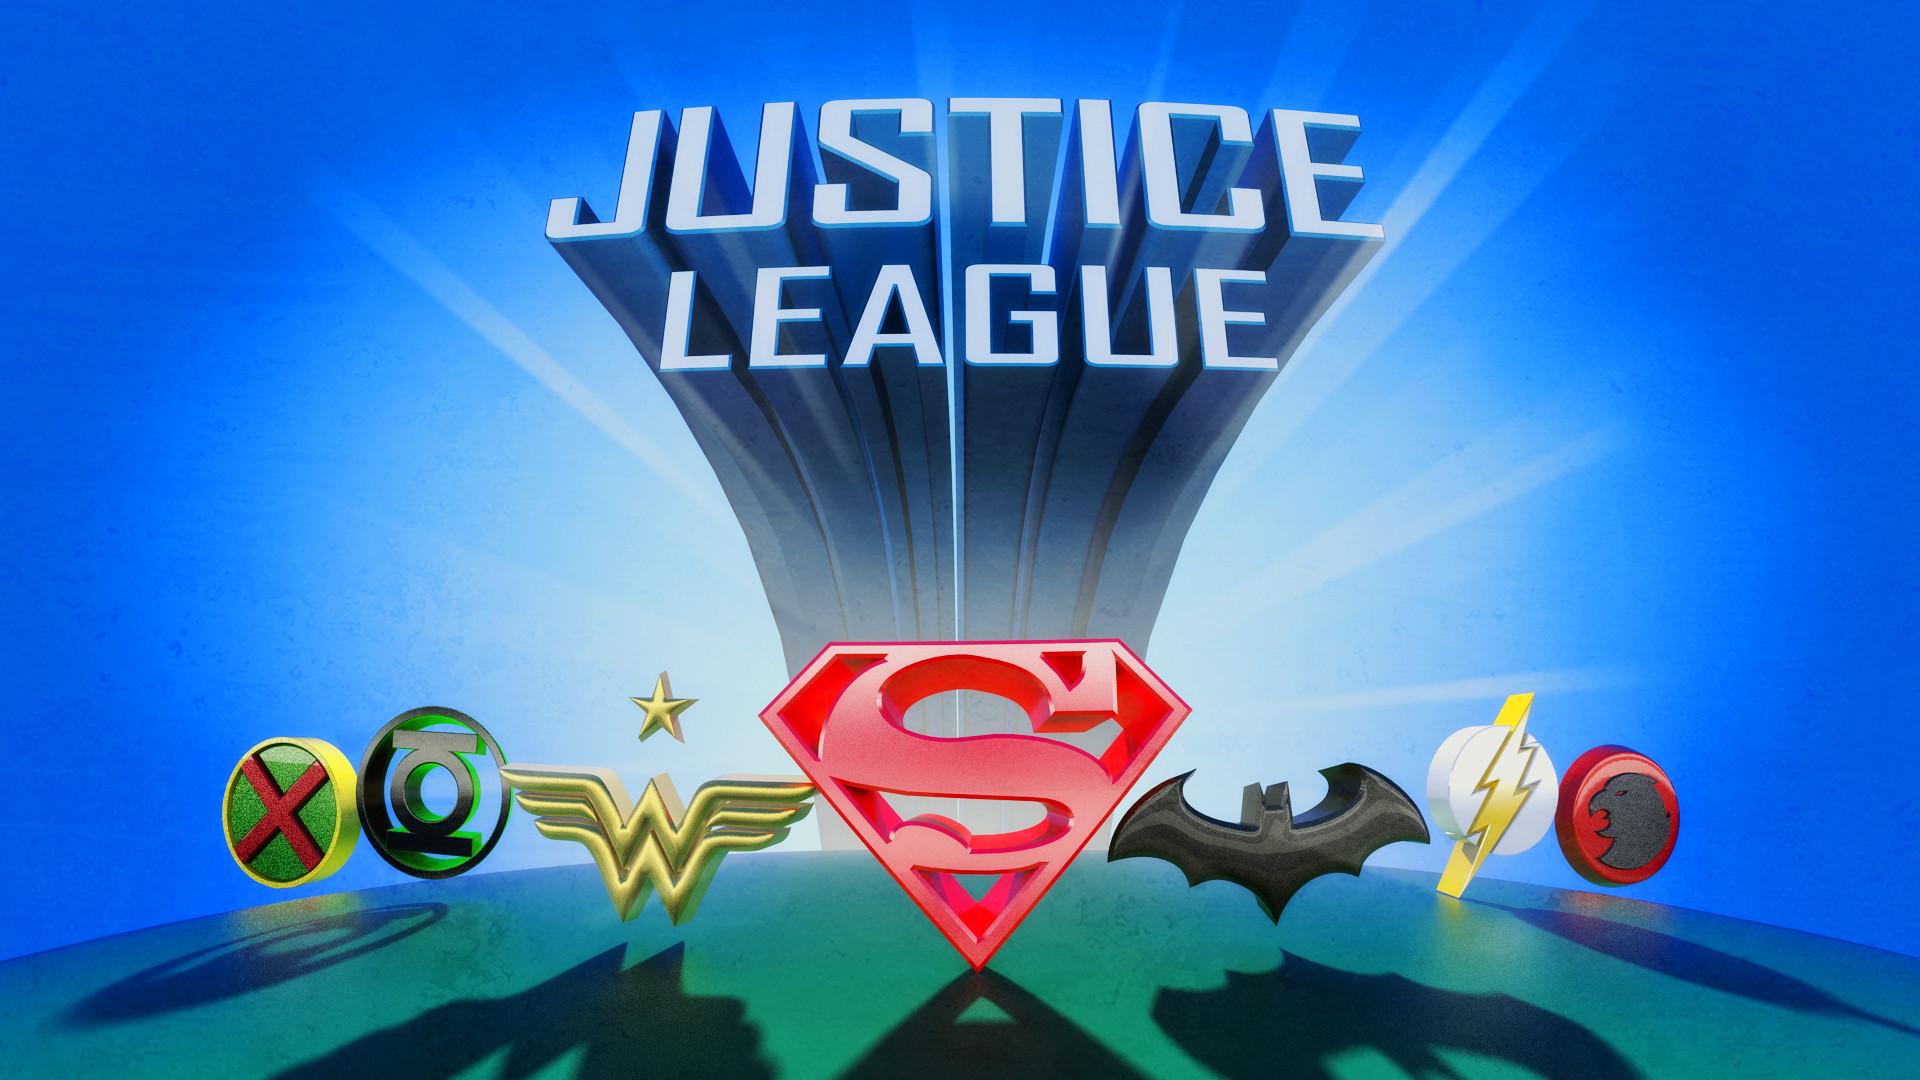 Justice League Title in 3D